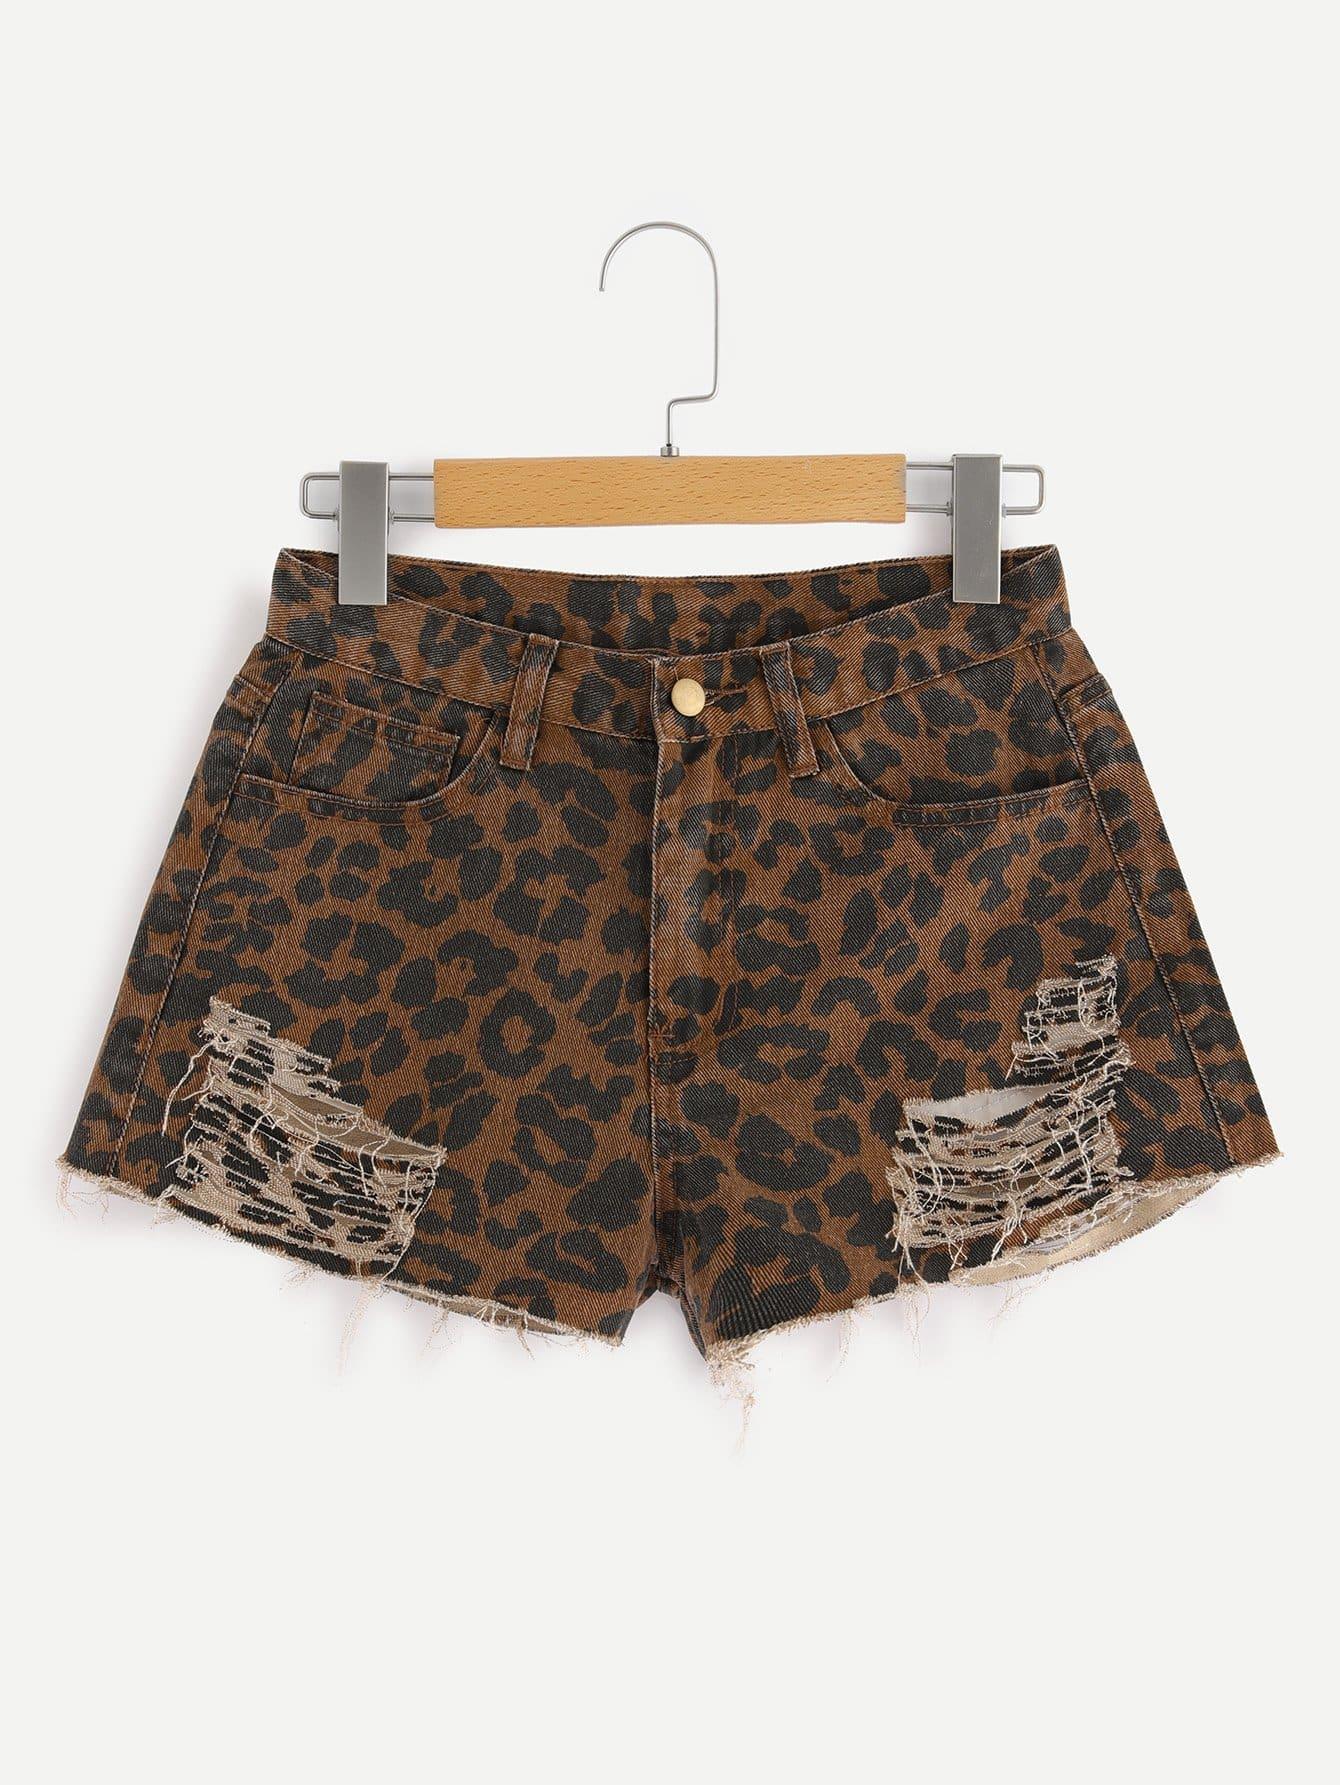 Купить Ripped Rame Hem Leopard Denim Shorts, null, SheIn